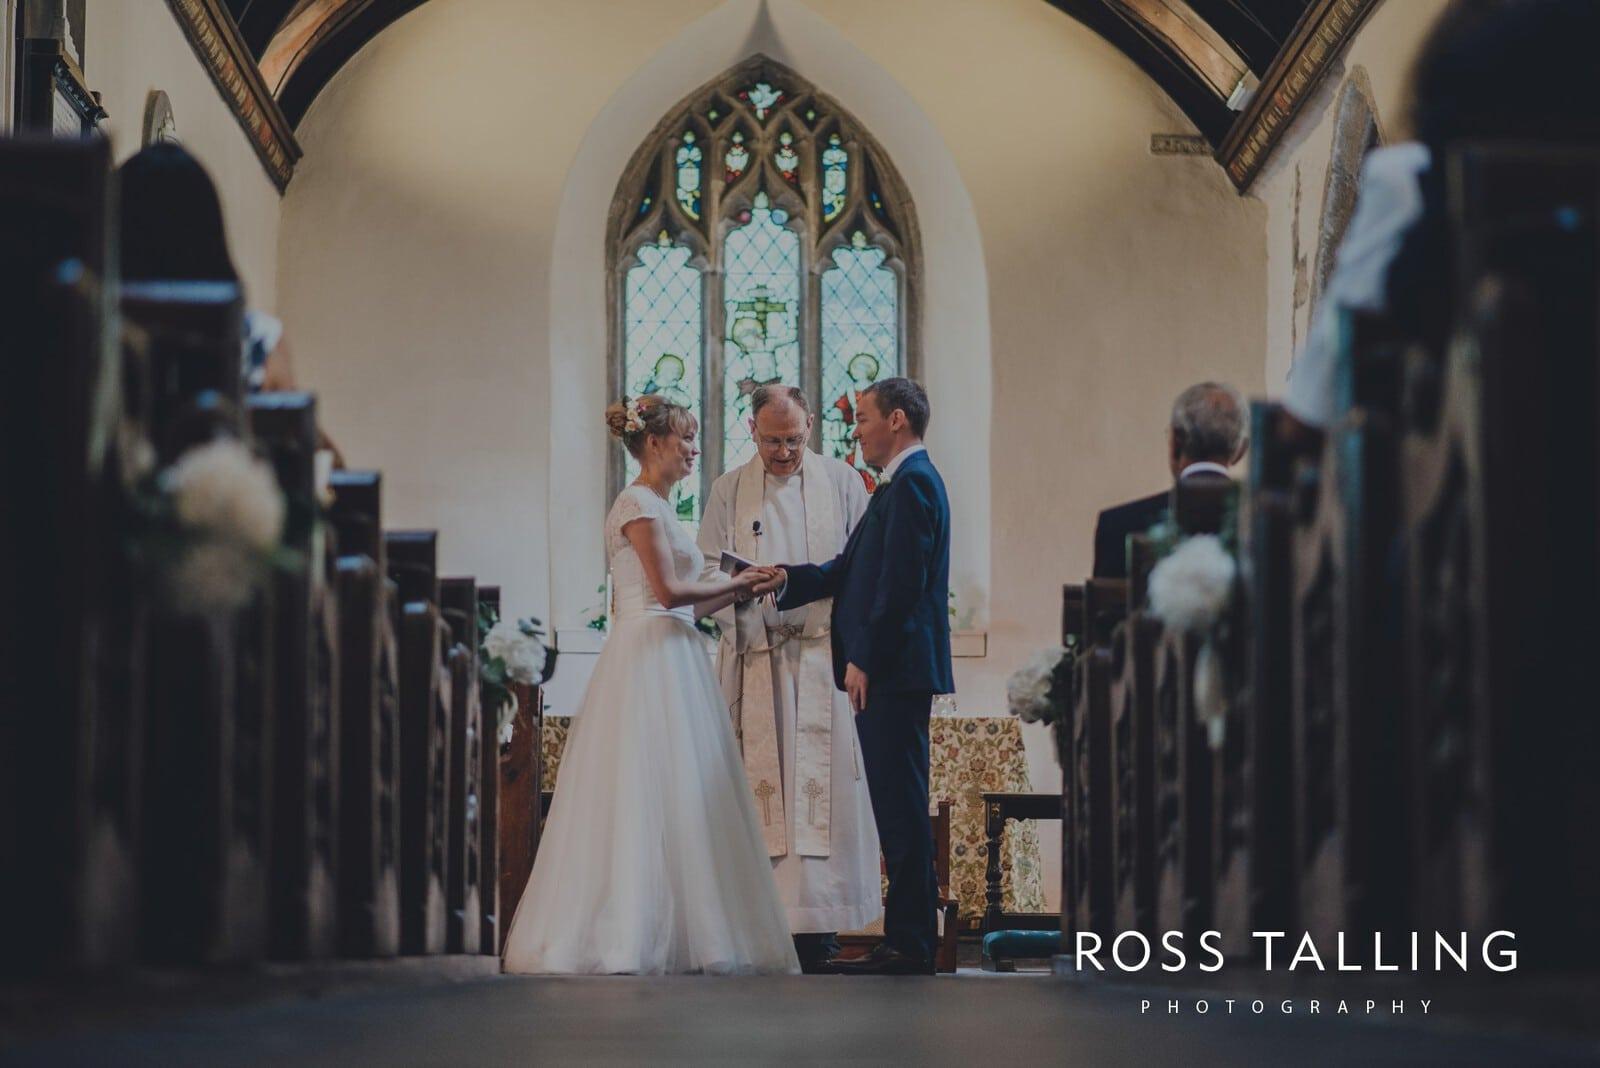 laura-matts-rosevine-hotel-wedding-photography-cornwall_0070